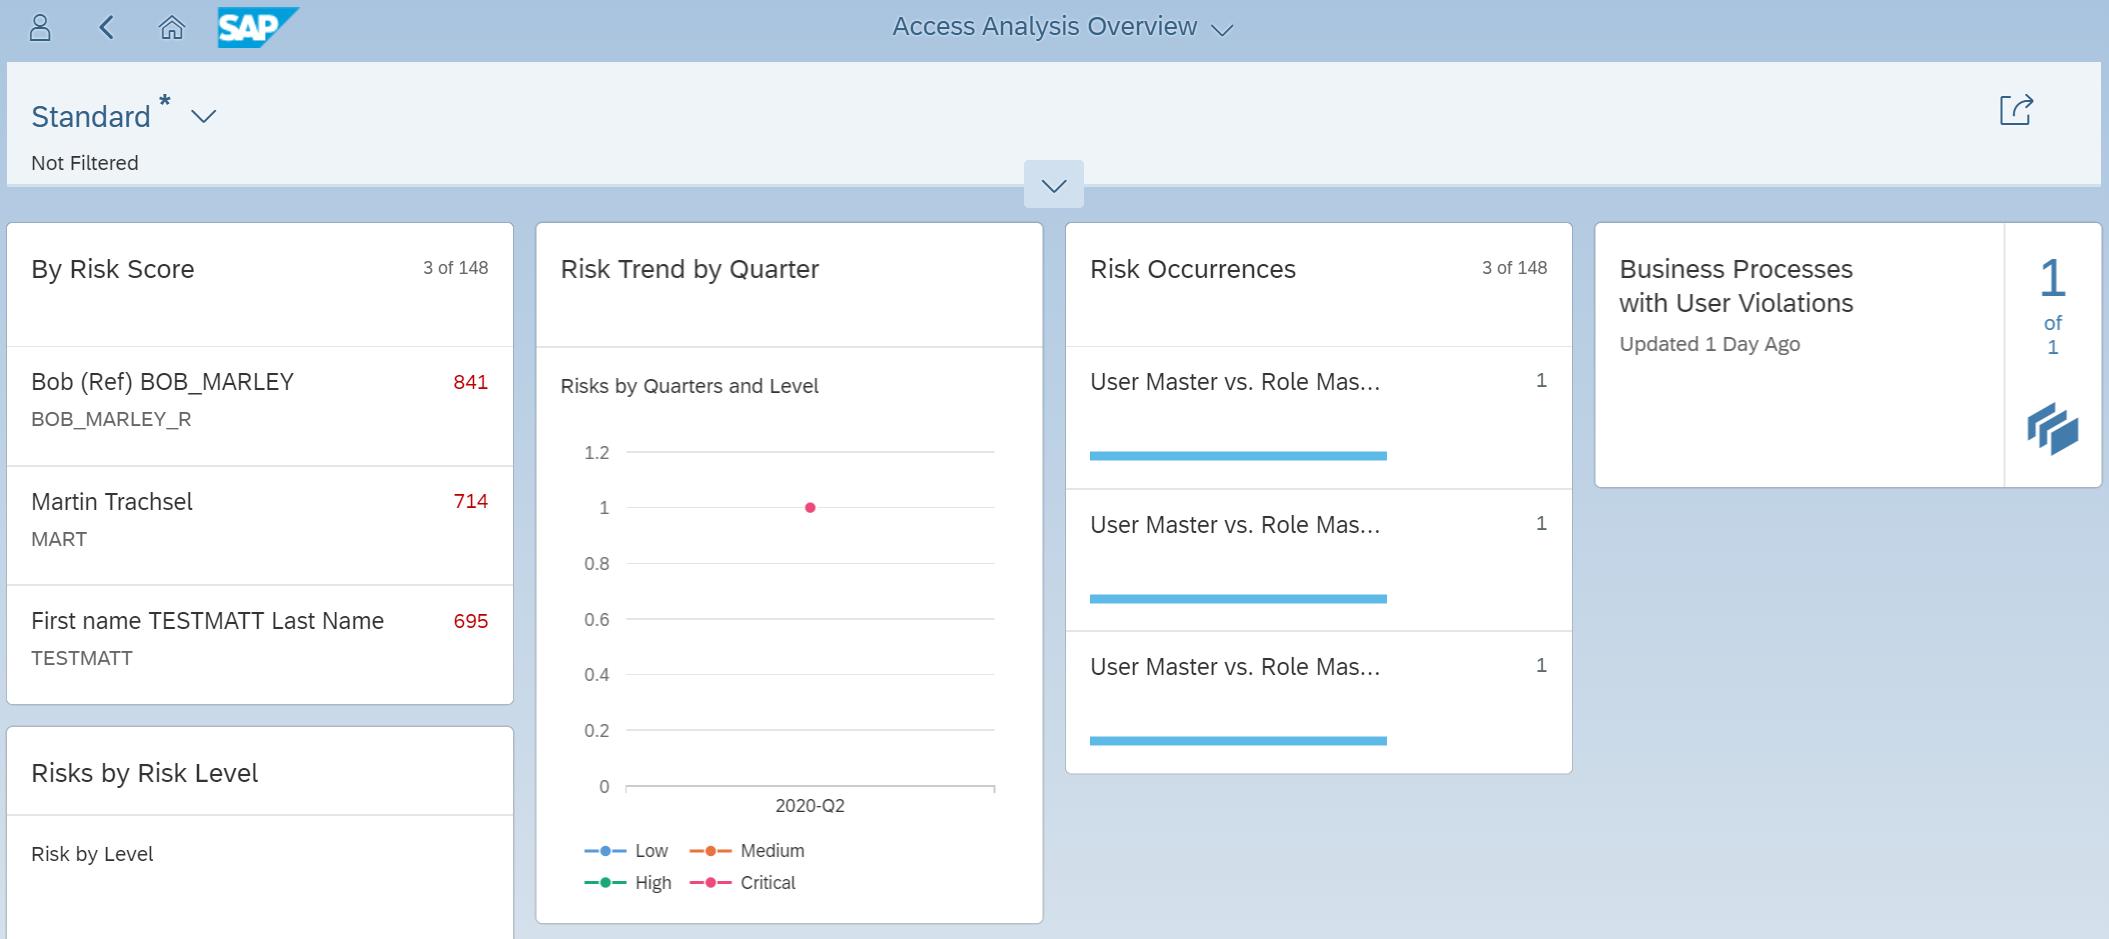 SAP Cloud IAG - Access Analysis Overview